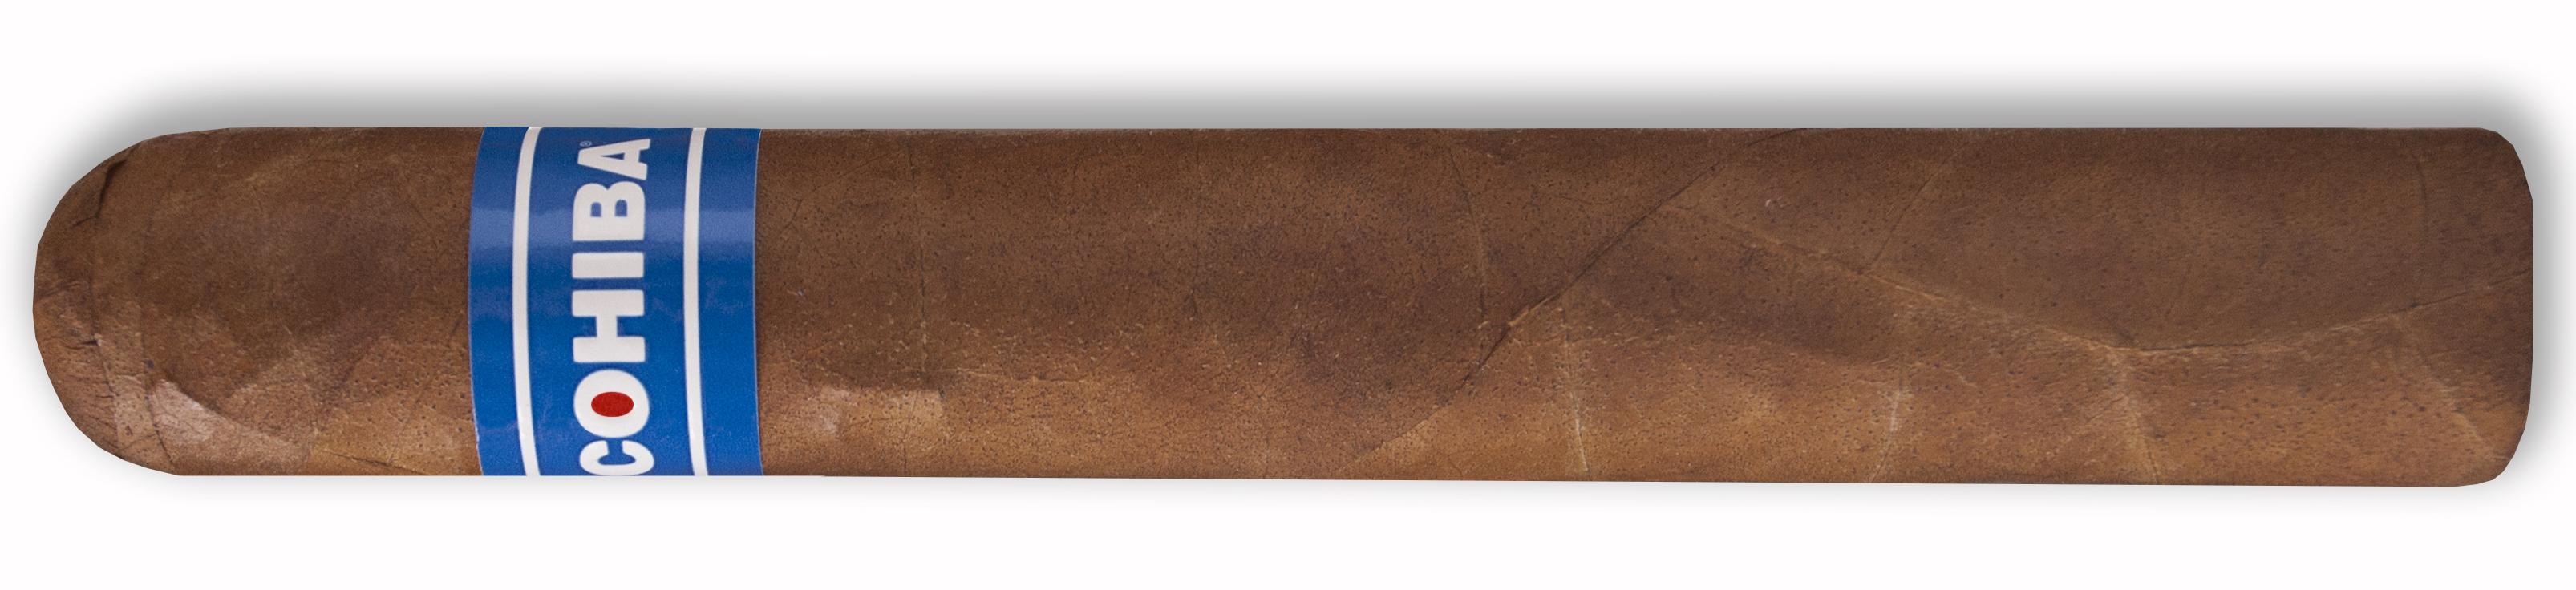 Cohiba Blue Cigar